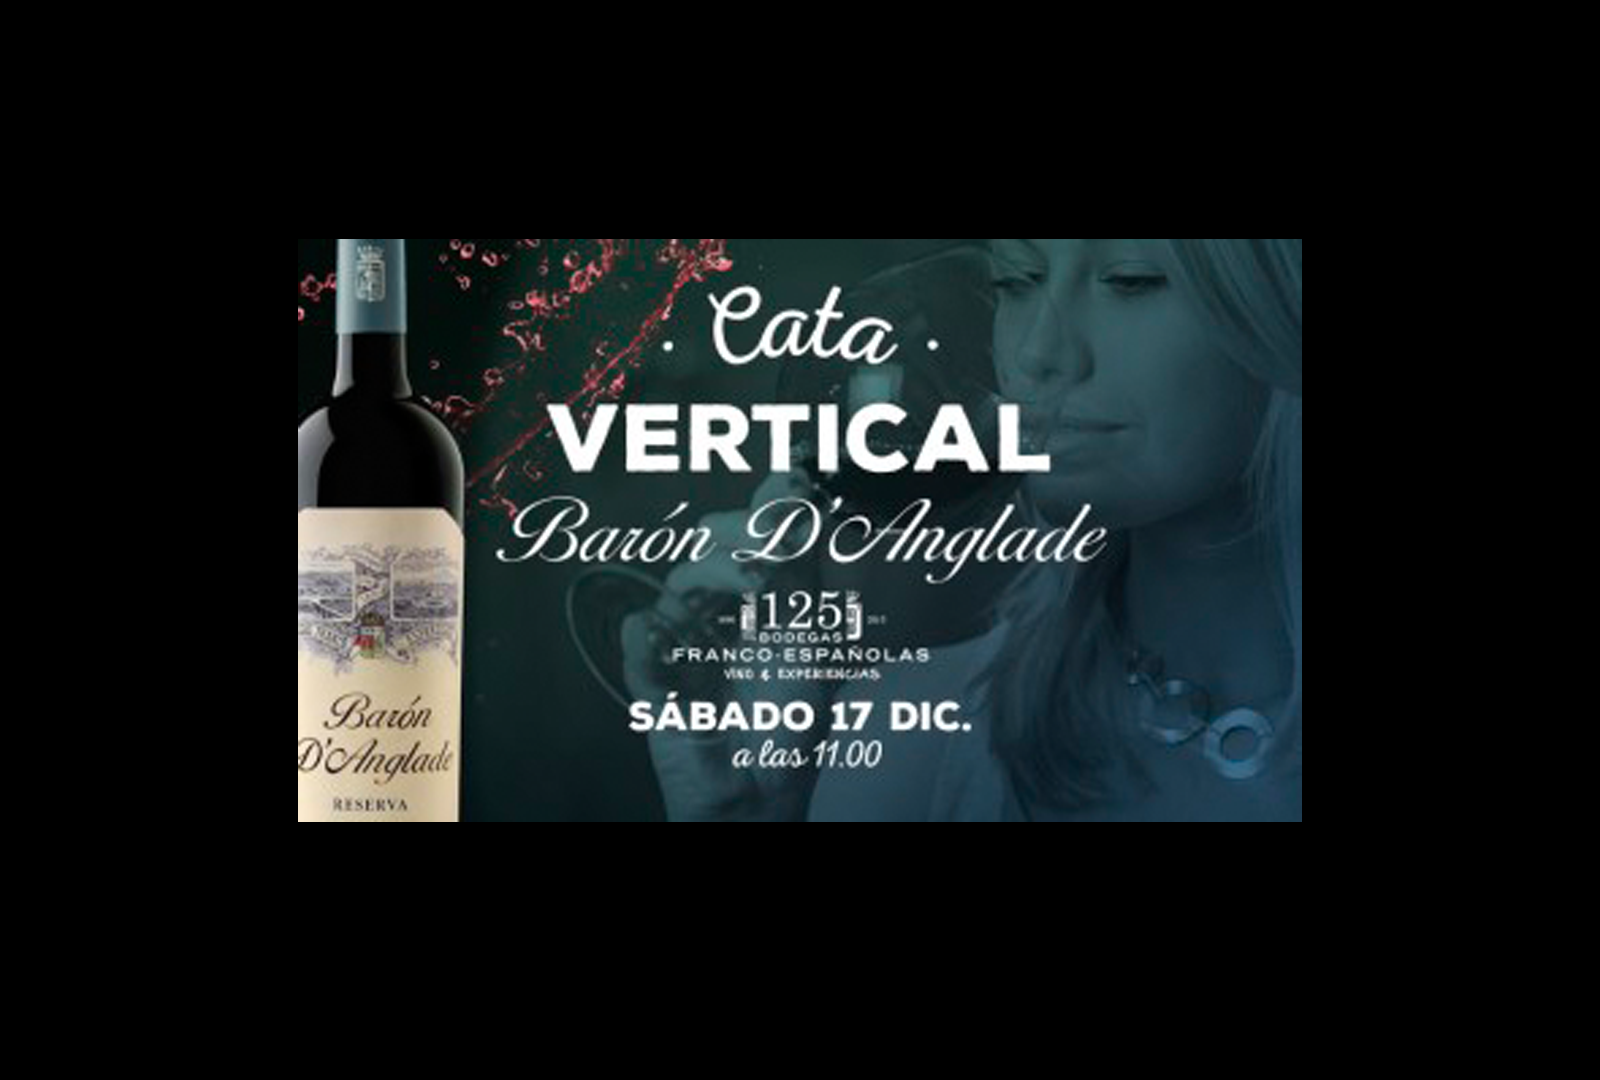 Catas de Vino - VINOS DIFERENTES